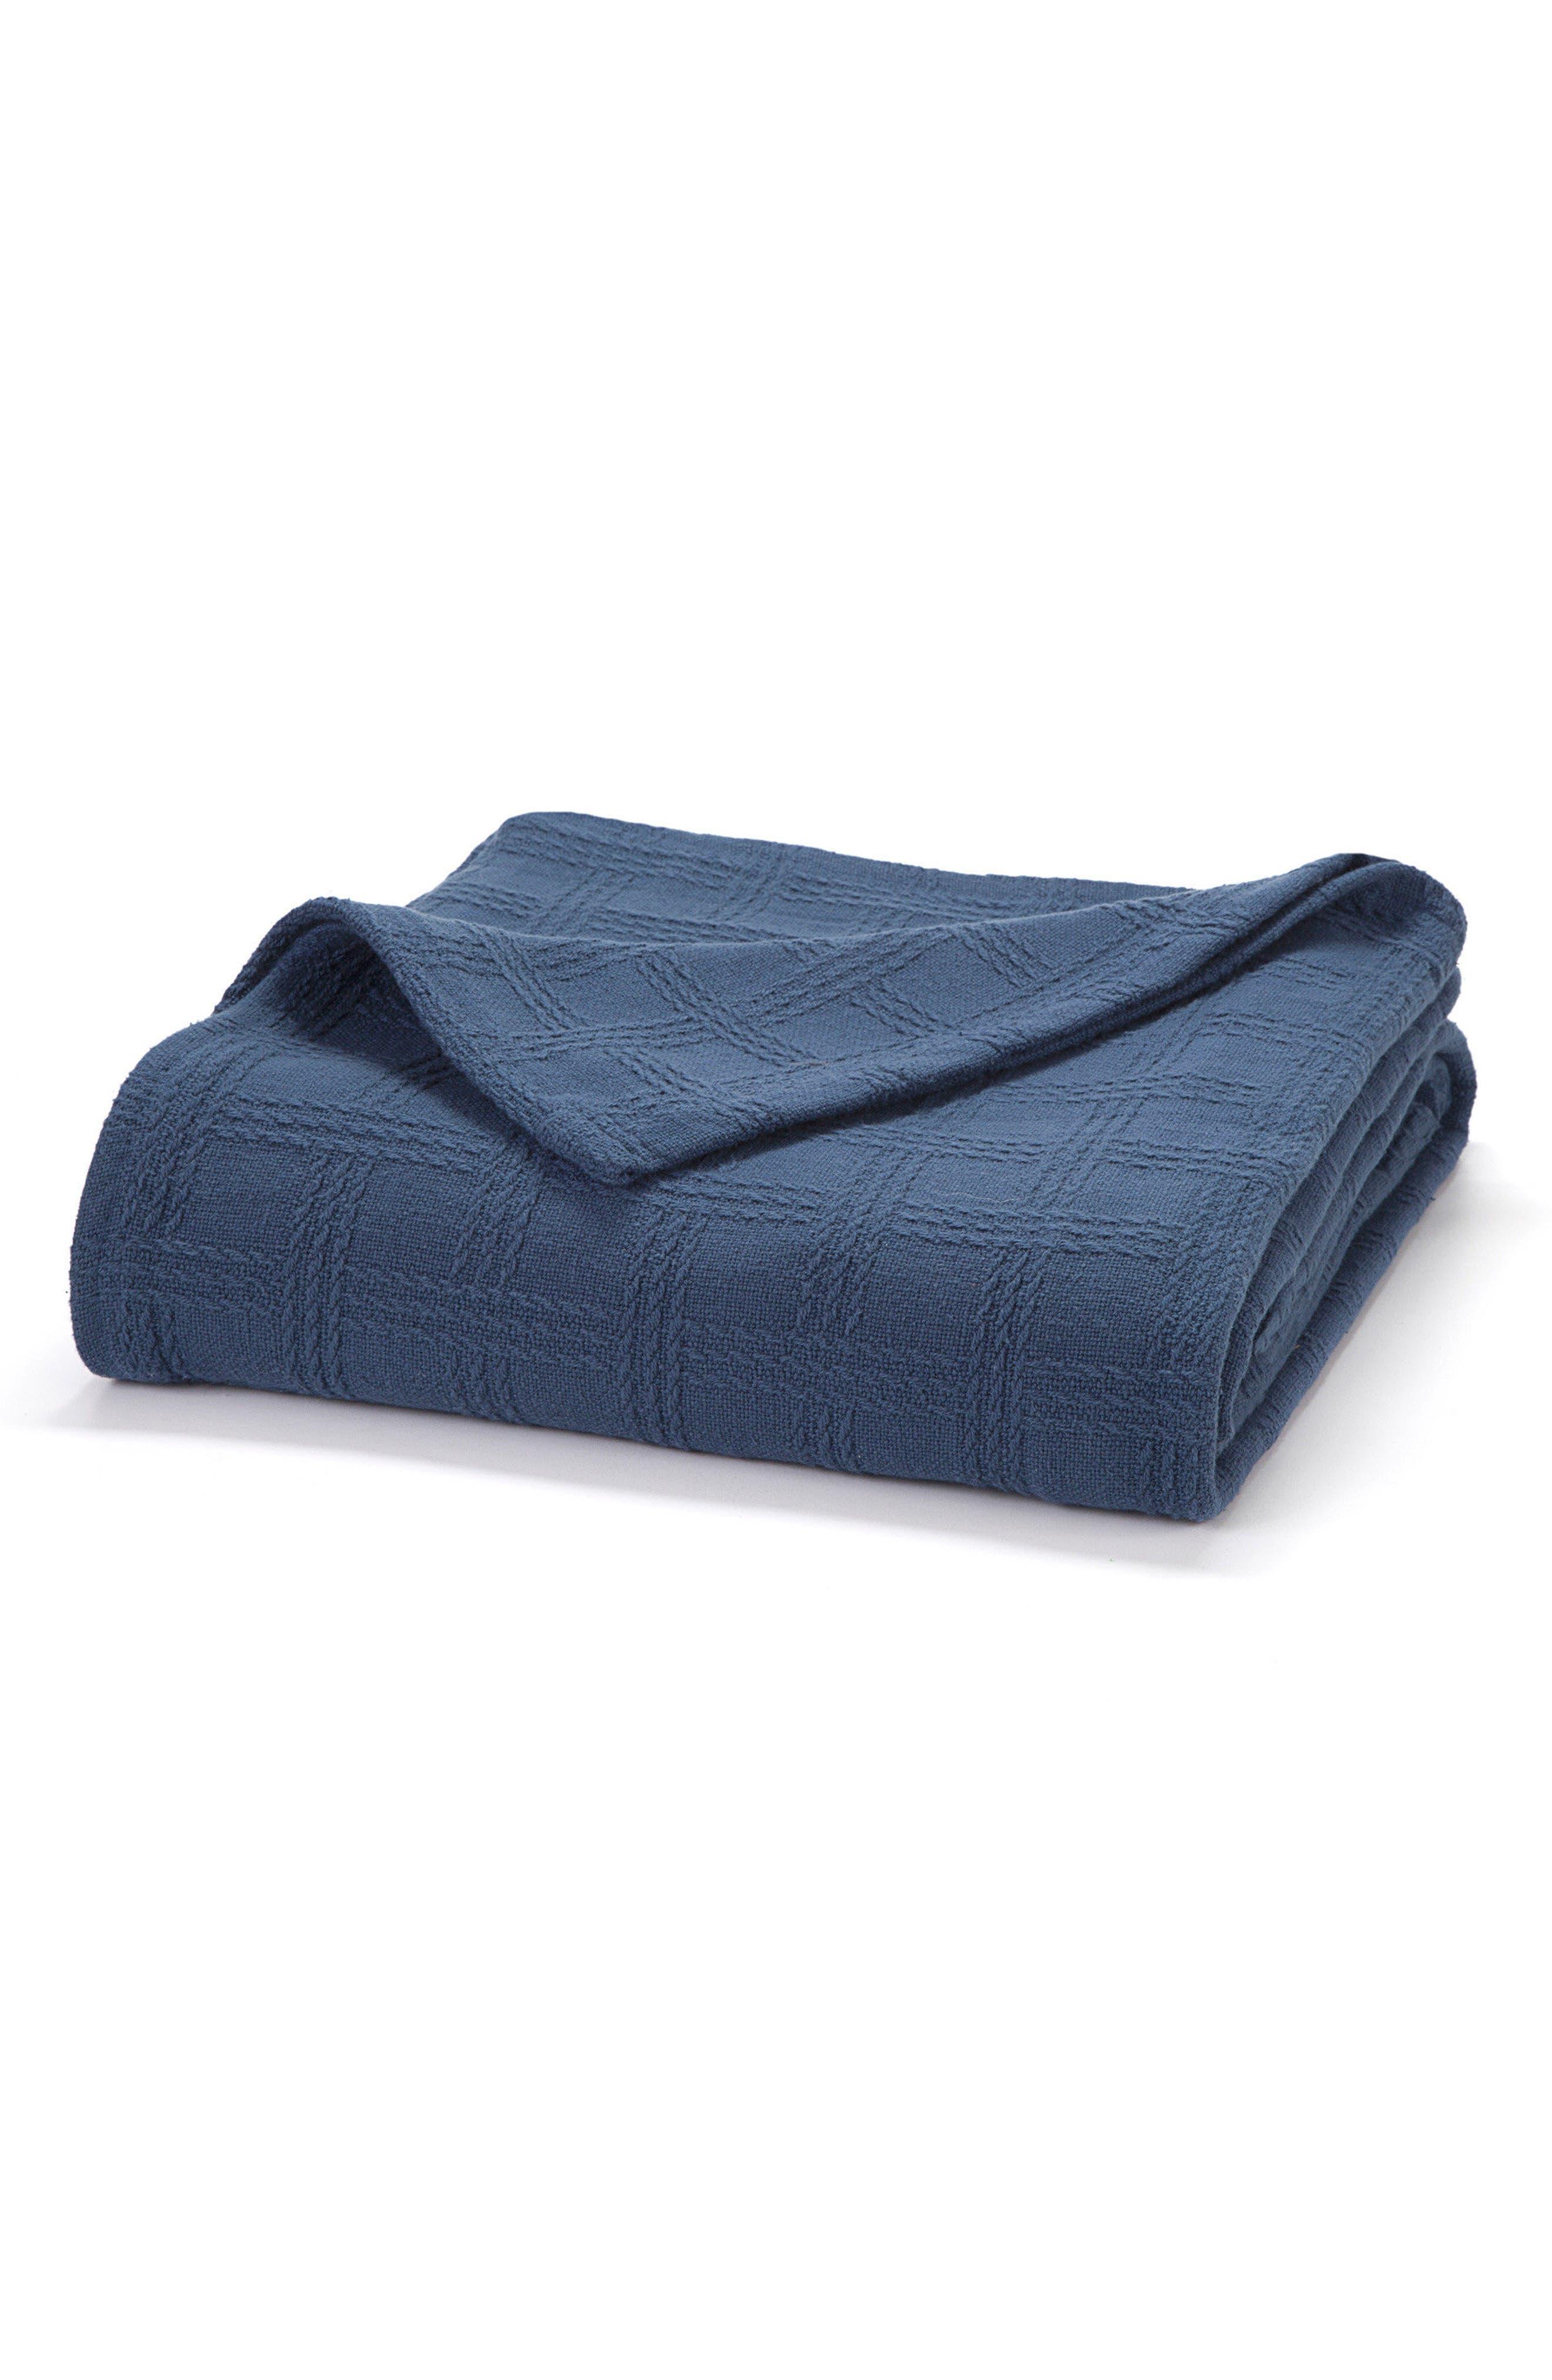 Classic Cotton Twin Size Blanket,                         Main,                         color, Nautical Blue